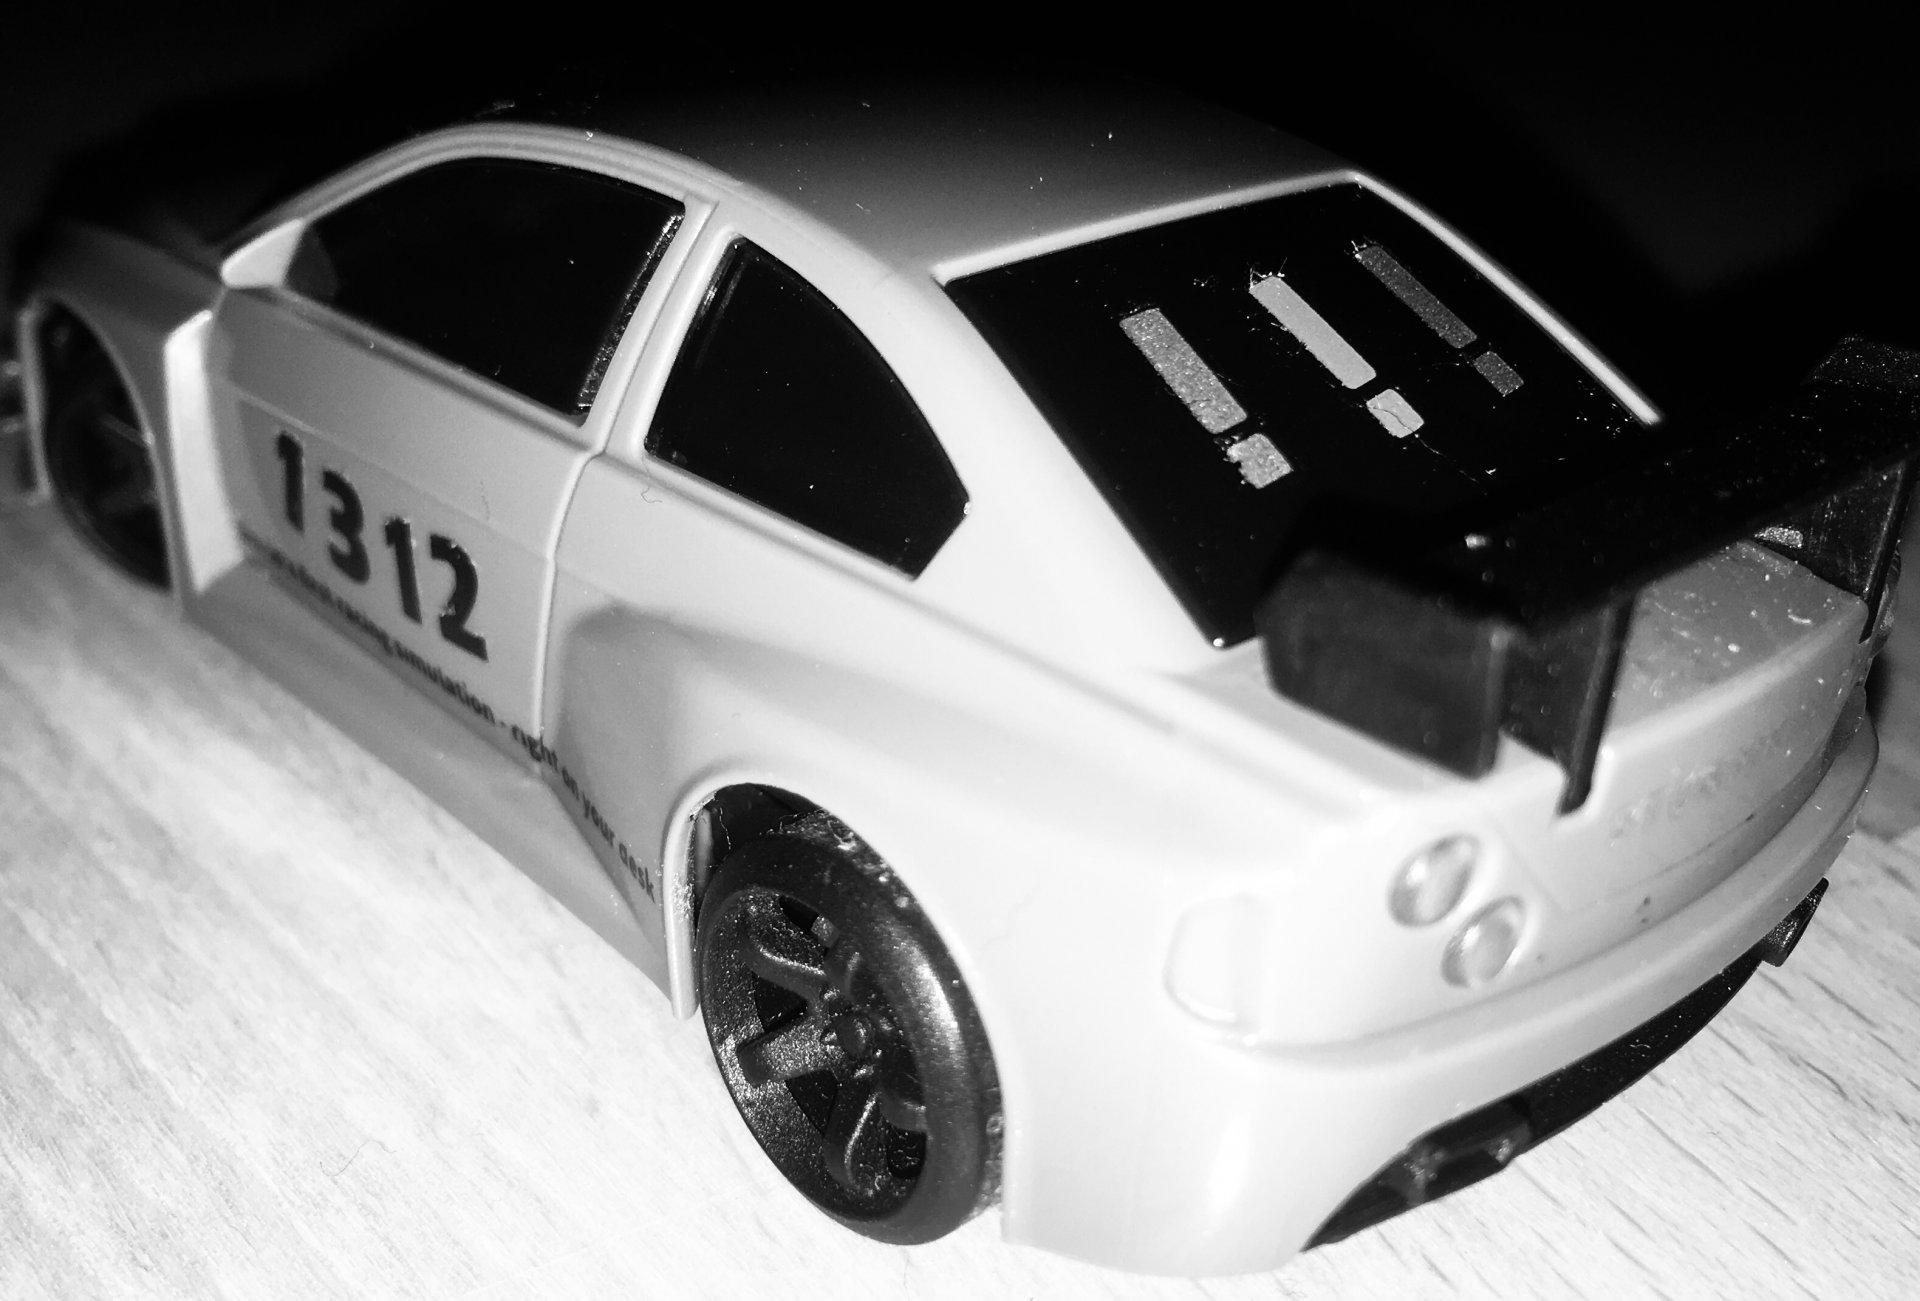 Mein kleiner Haze Racer V8